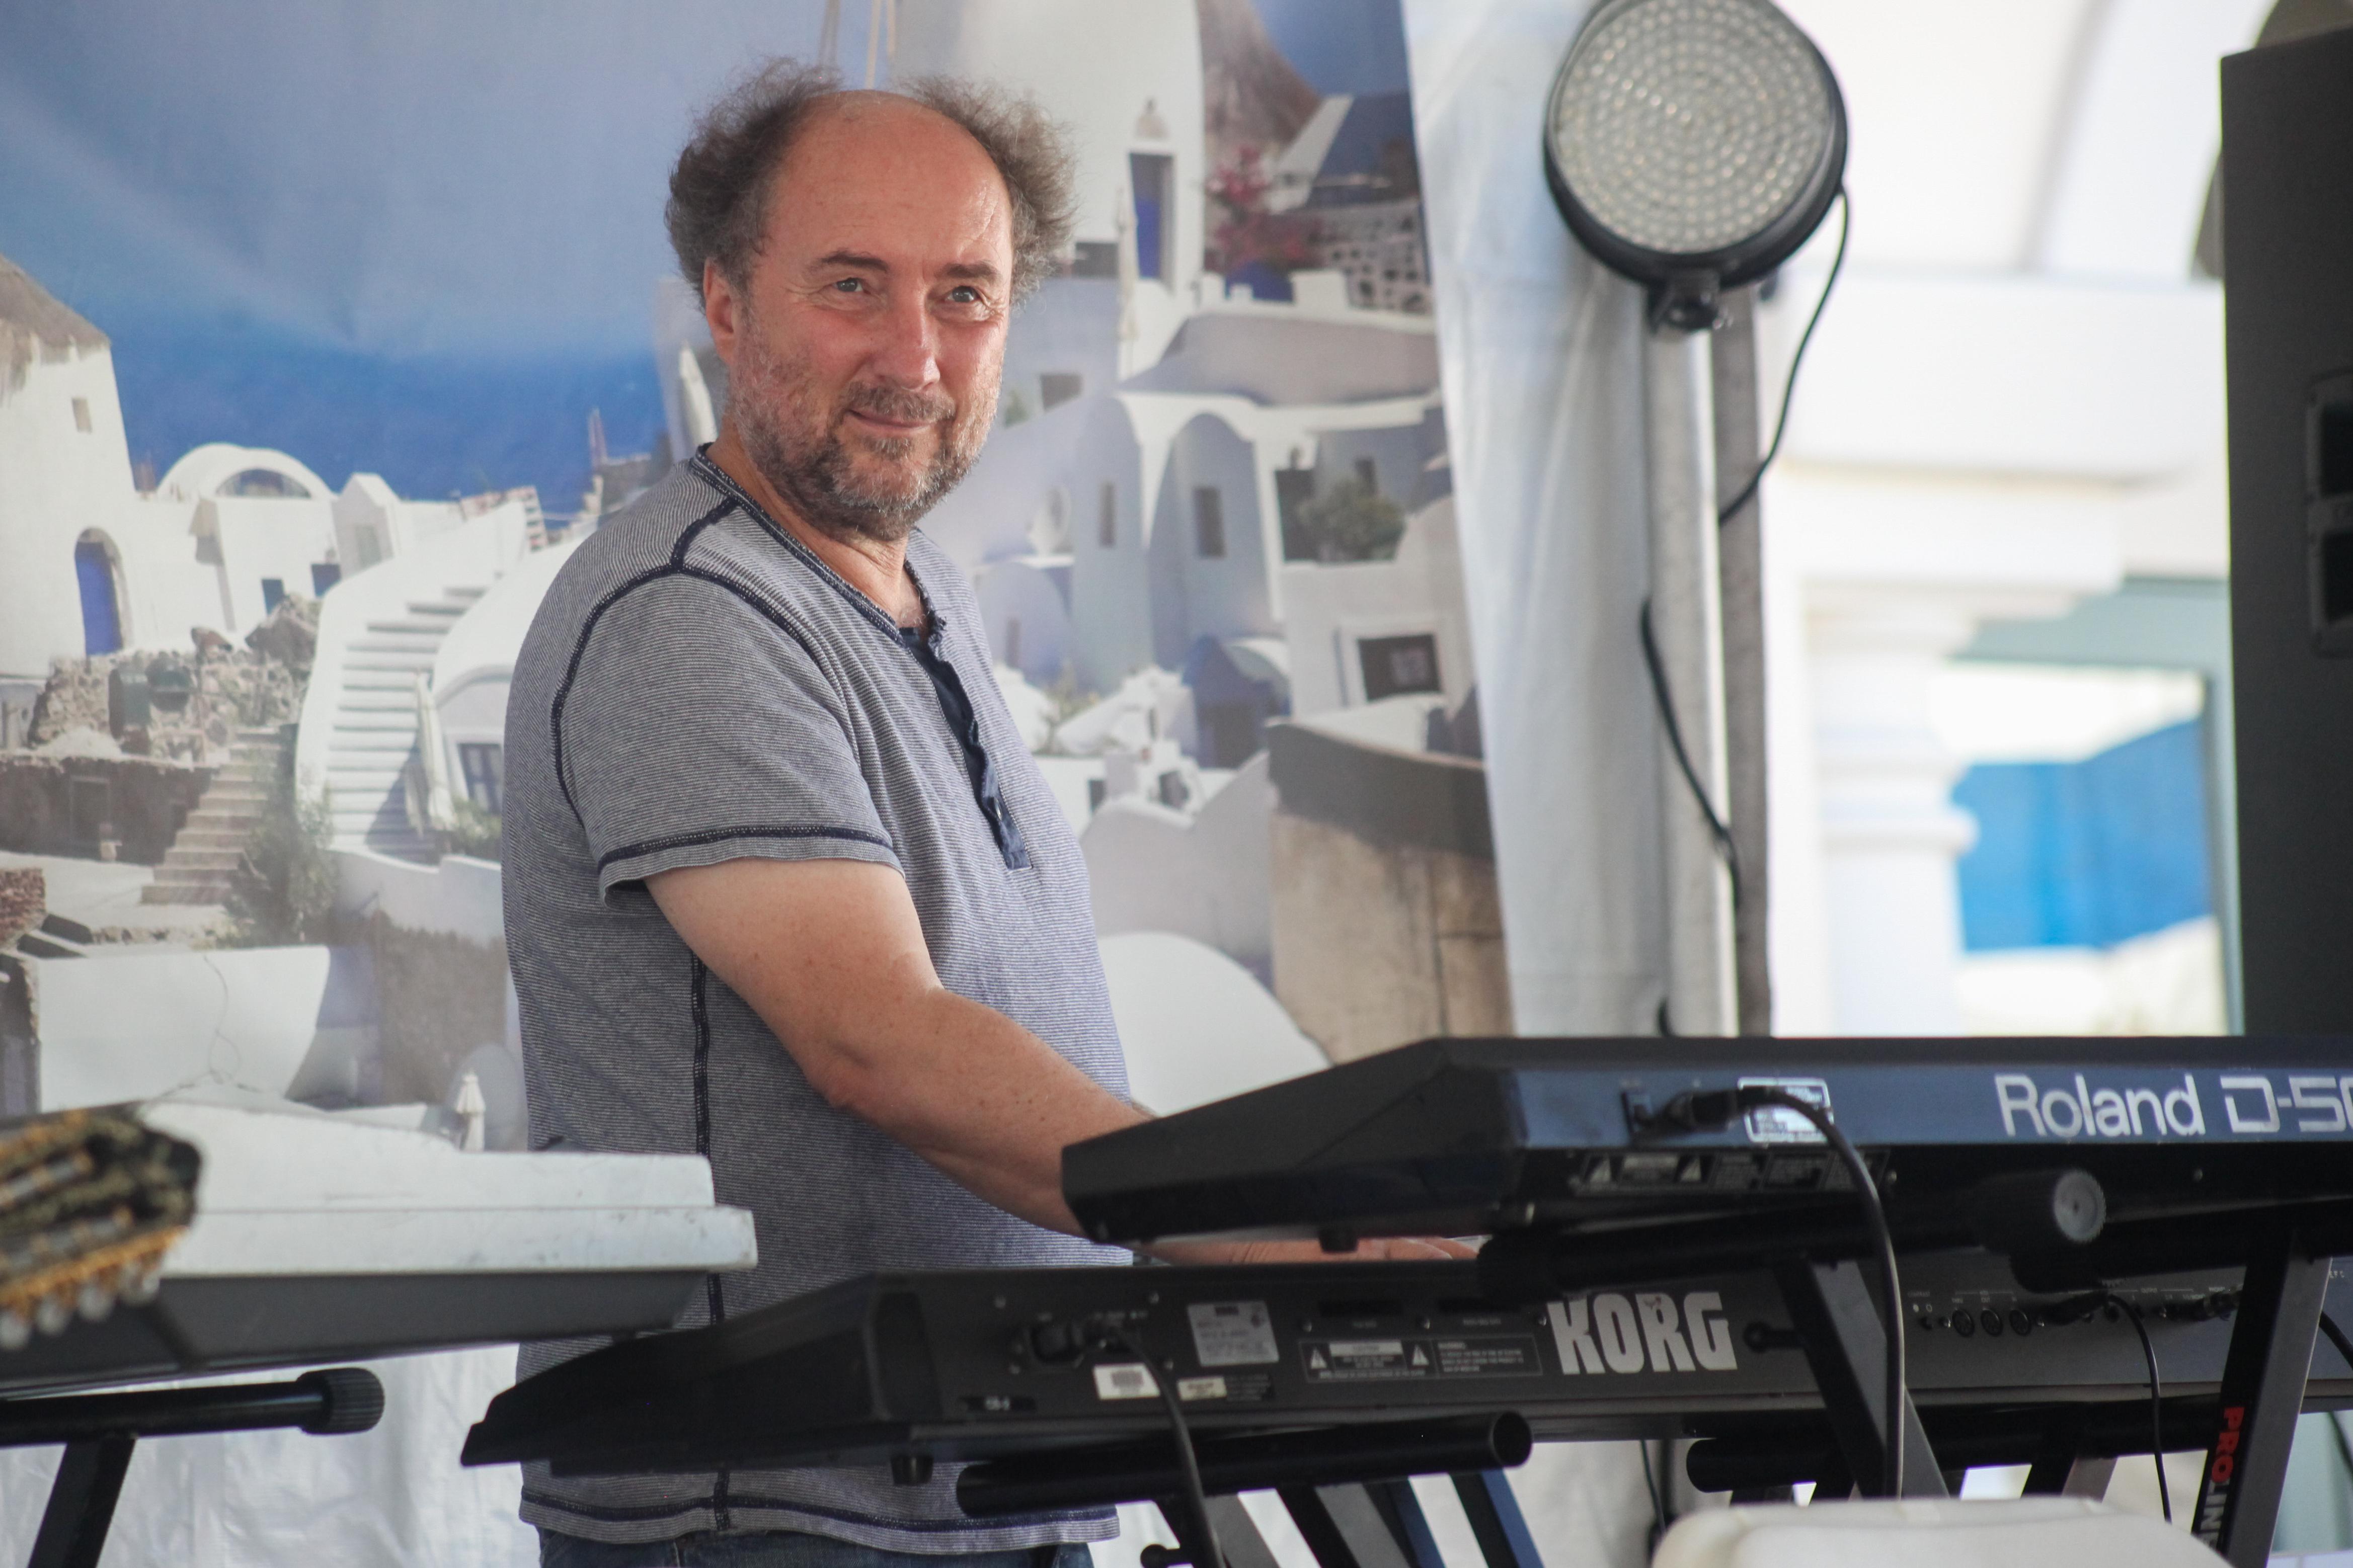 Greek Festival Celebrates Culture, Fosters Community   The